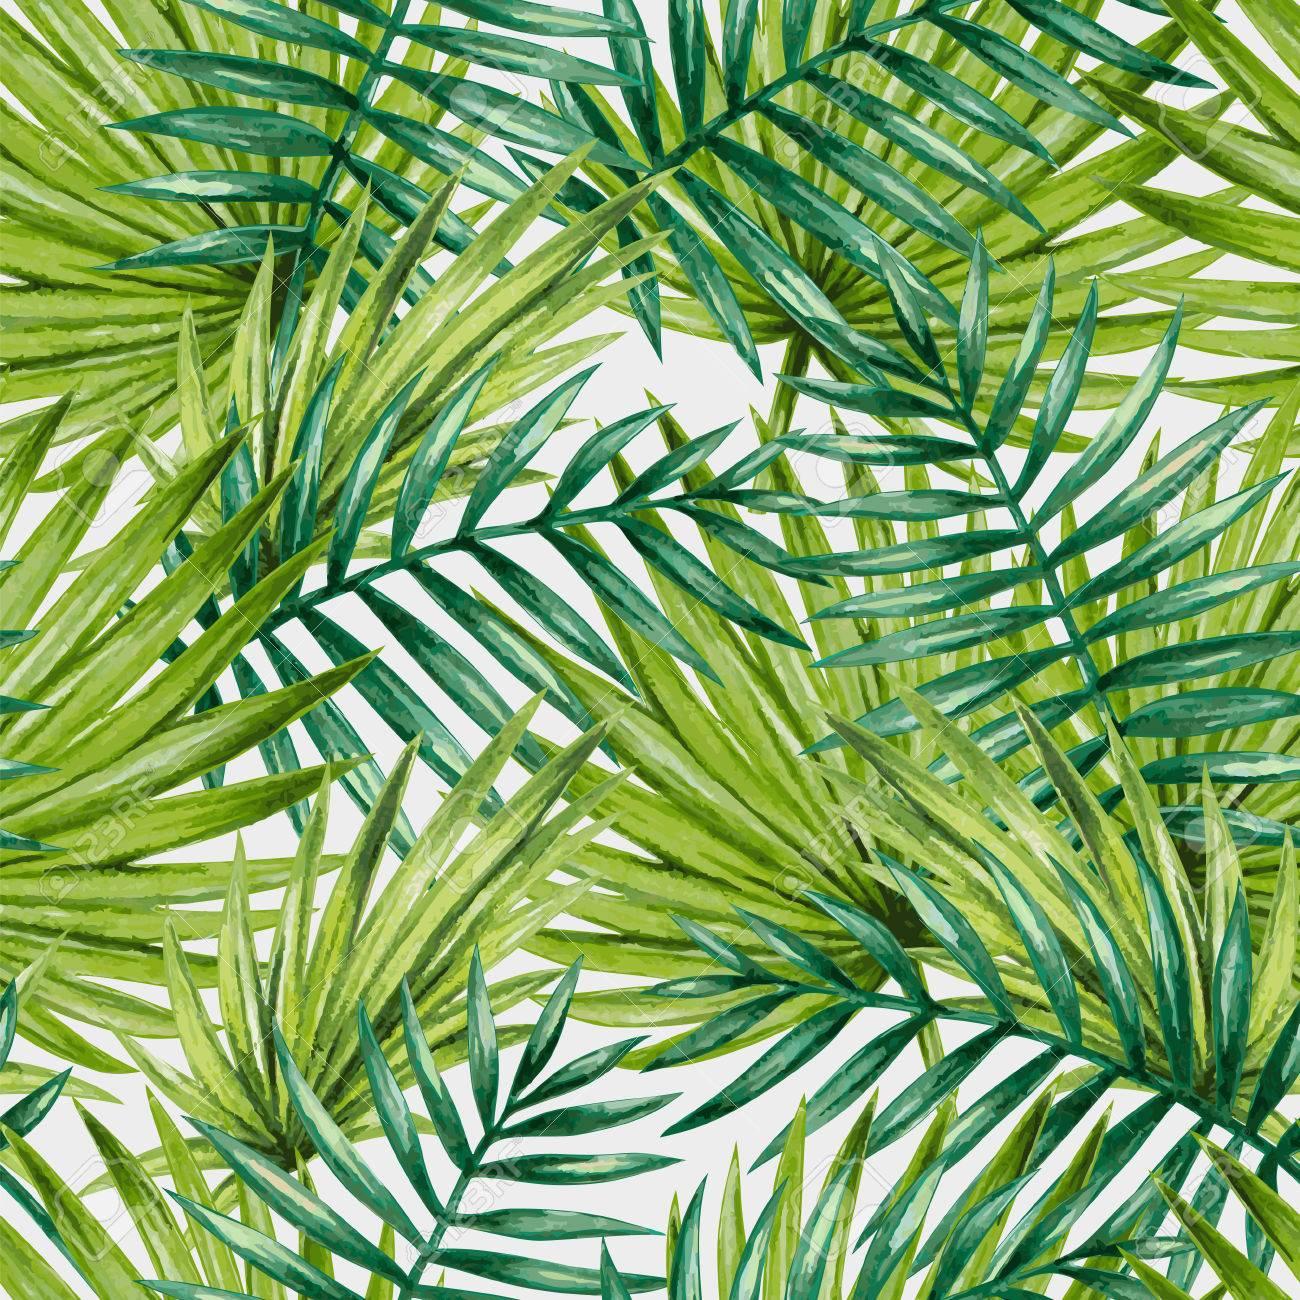 Aquarell Tropische Palmen Blatter Nahtlose Muster Vektor